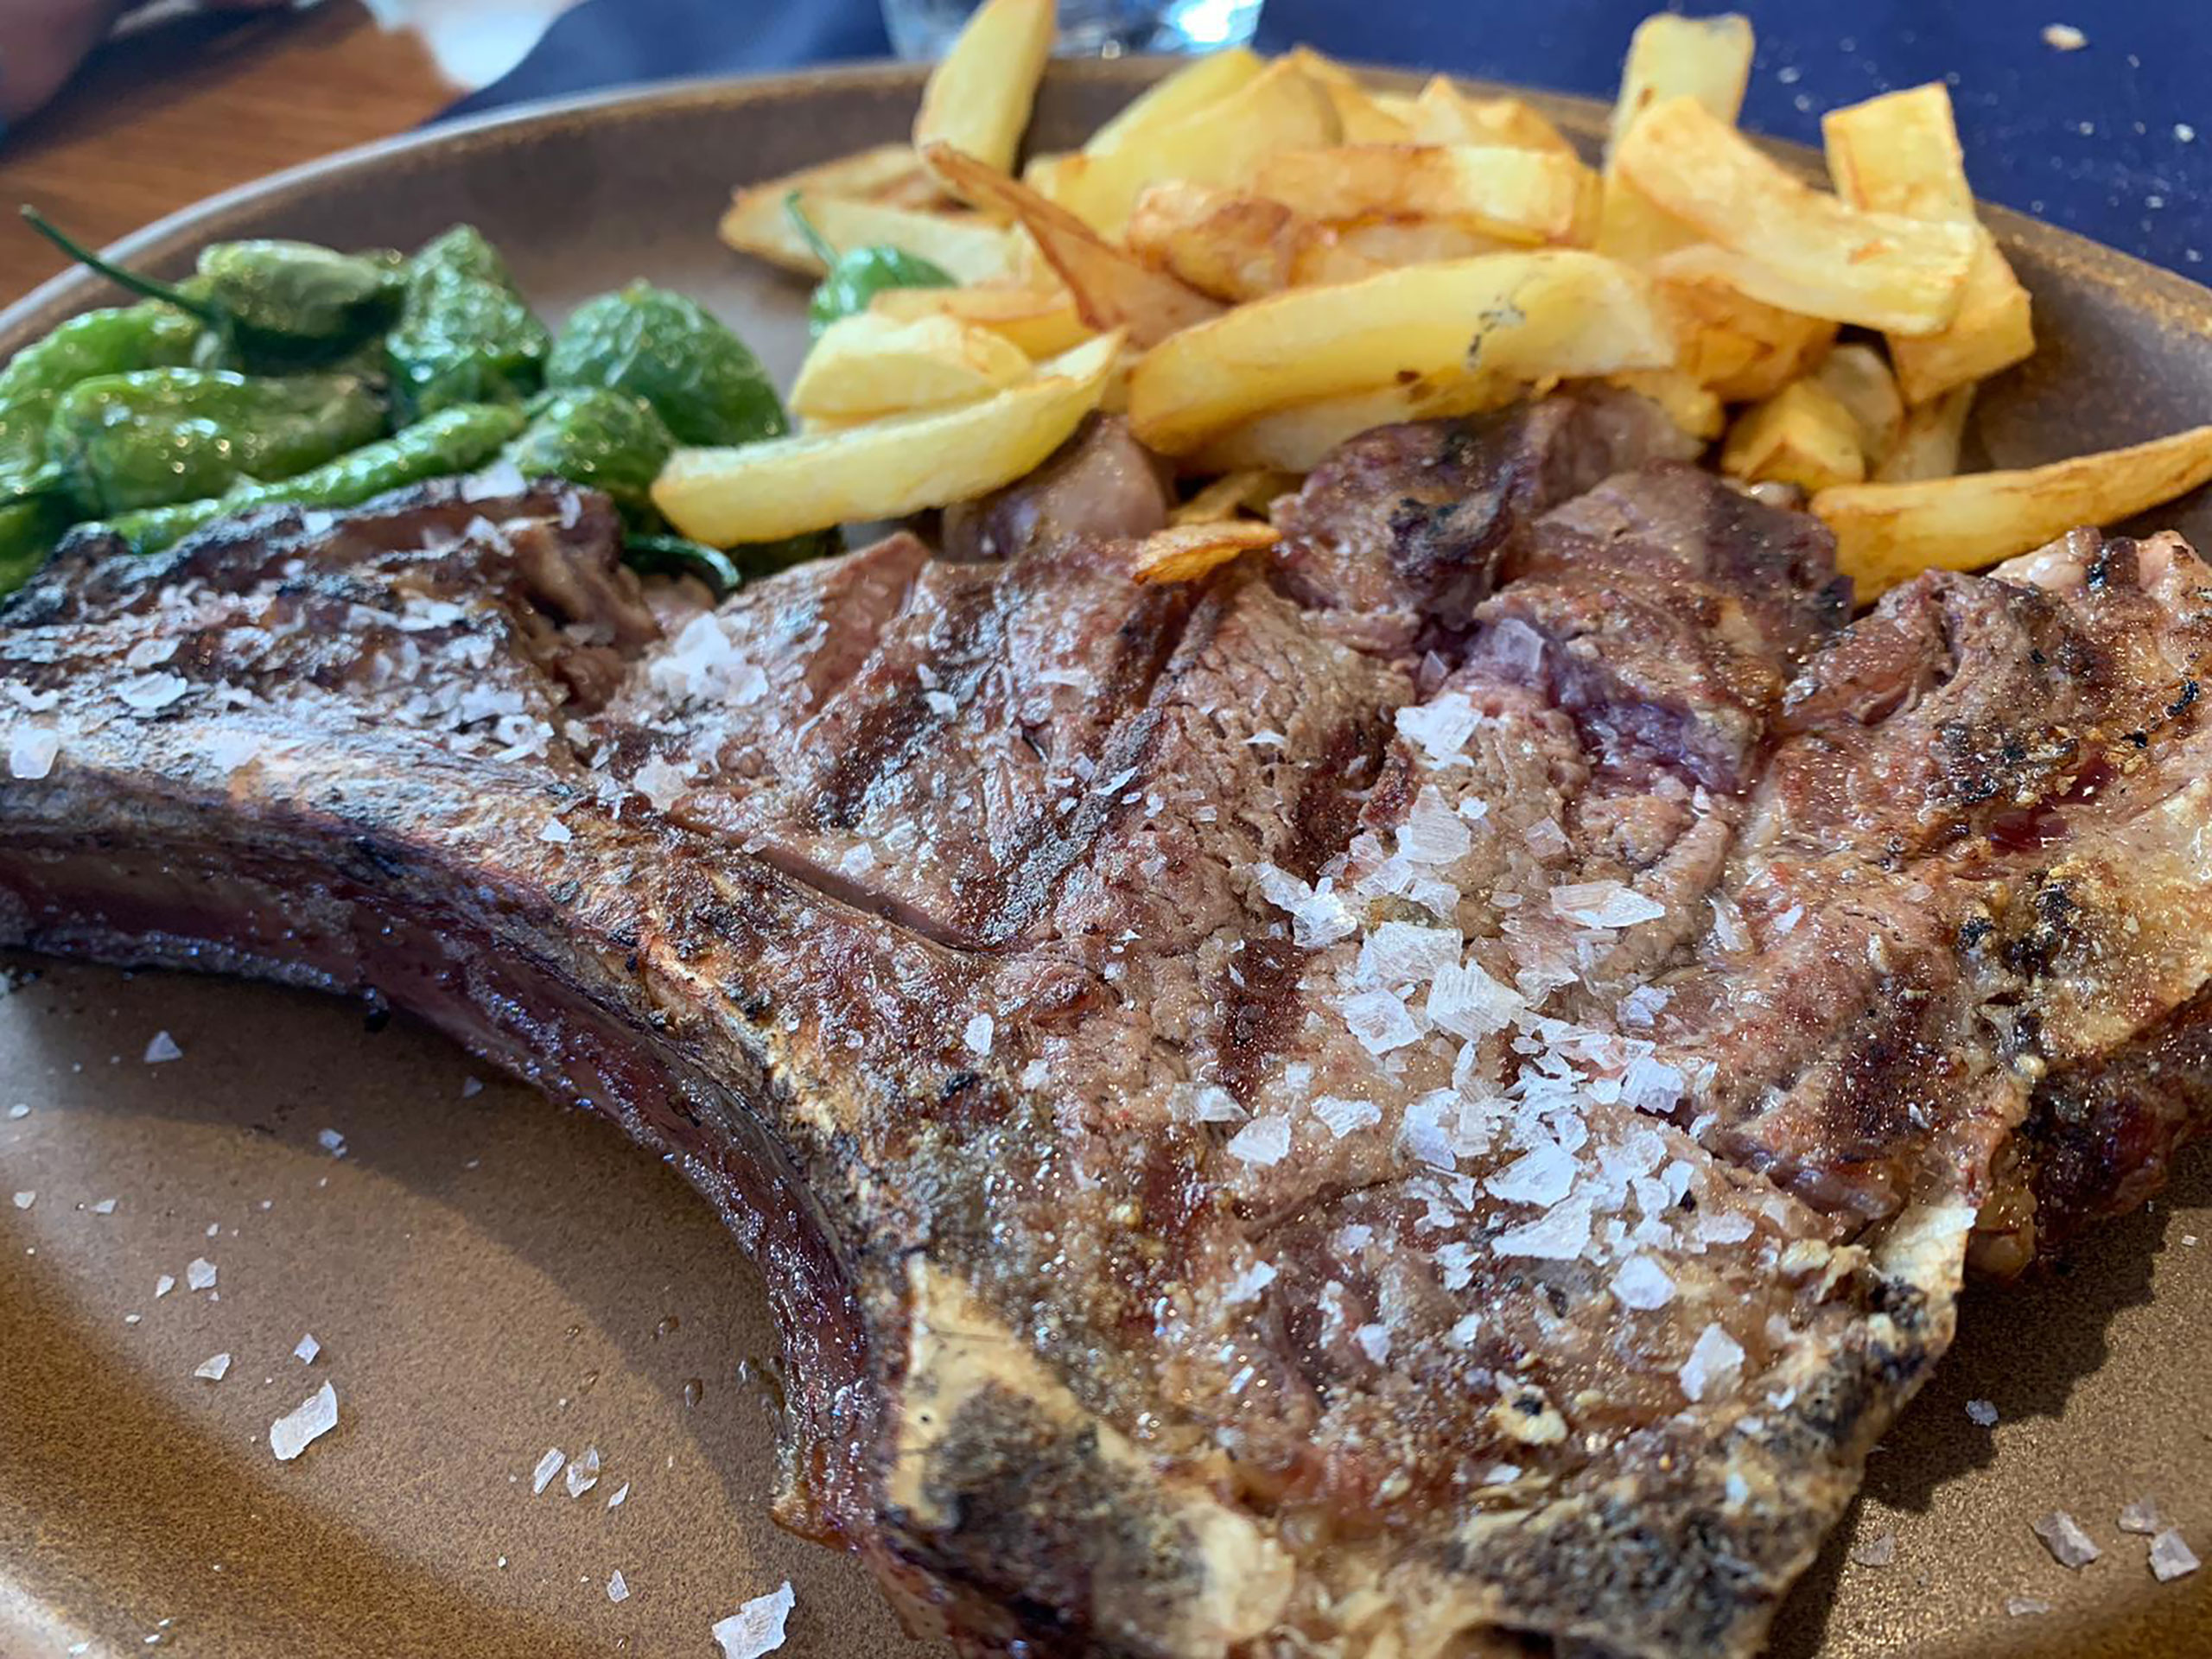 Restaurantes tradicionales en Pamplona: Irulegui e Ibamendi